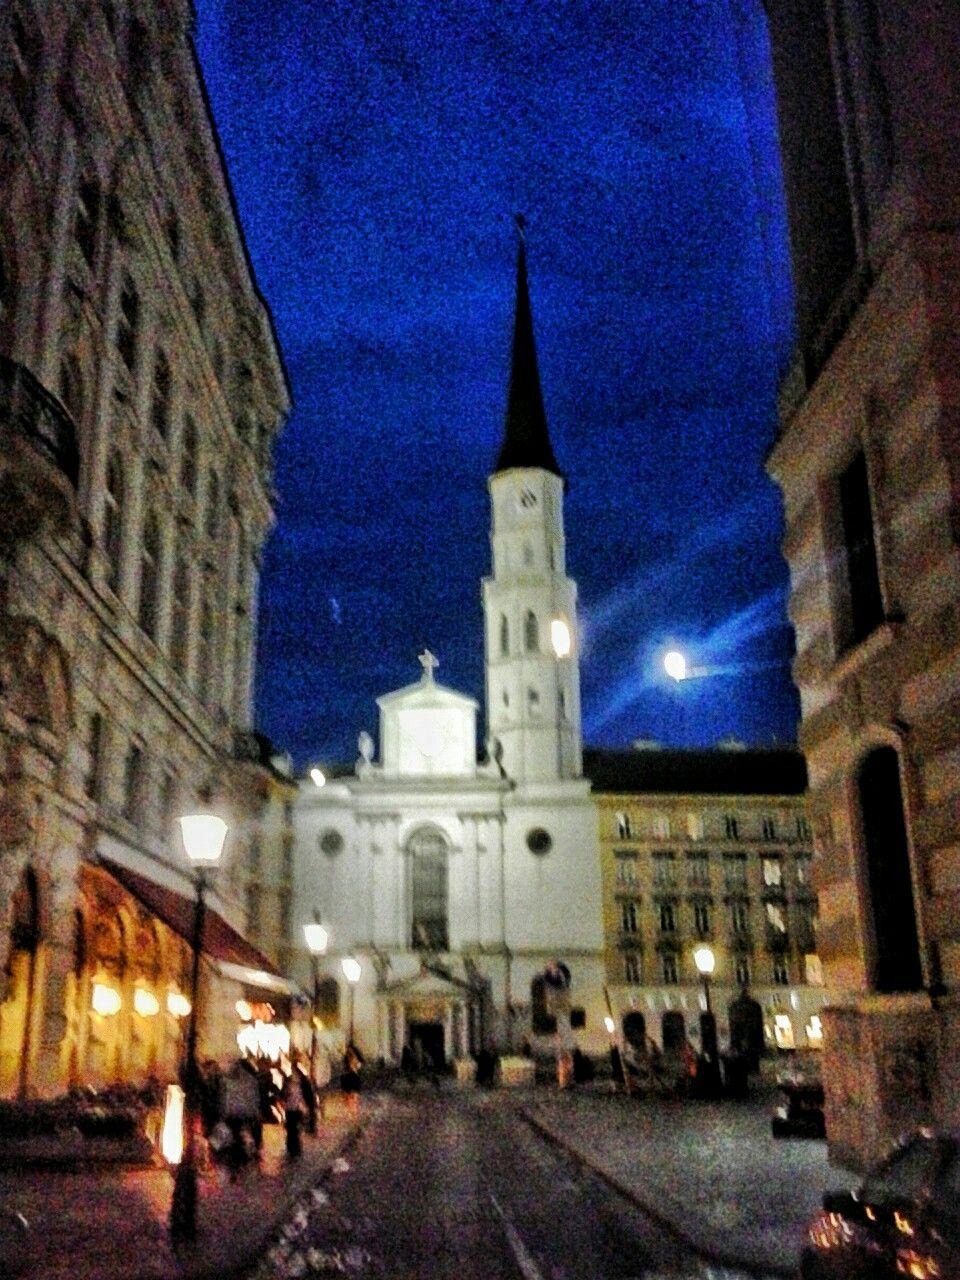 michaelerkirche / wien / austria - photo by serdar bulgu